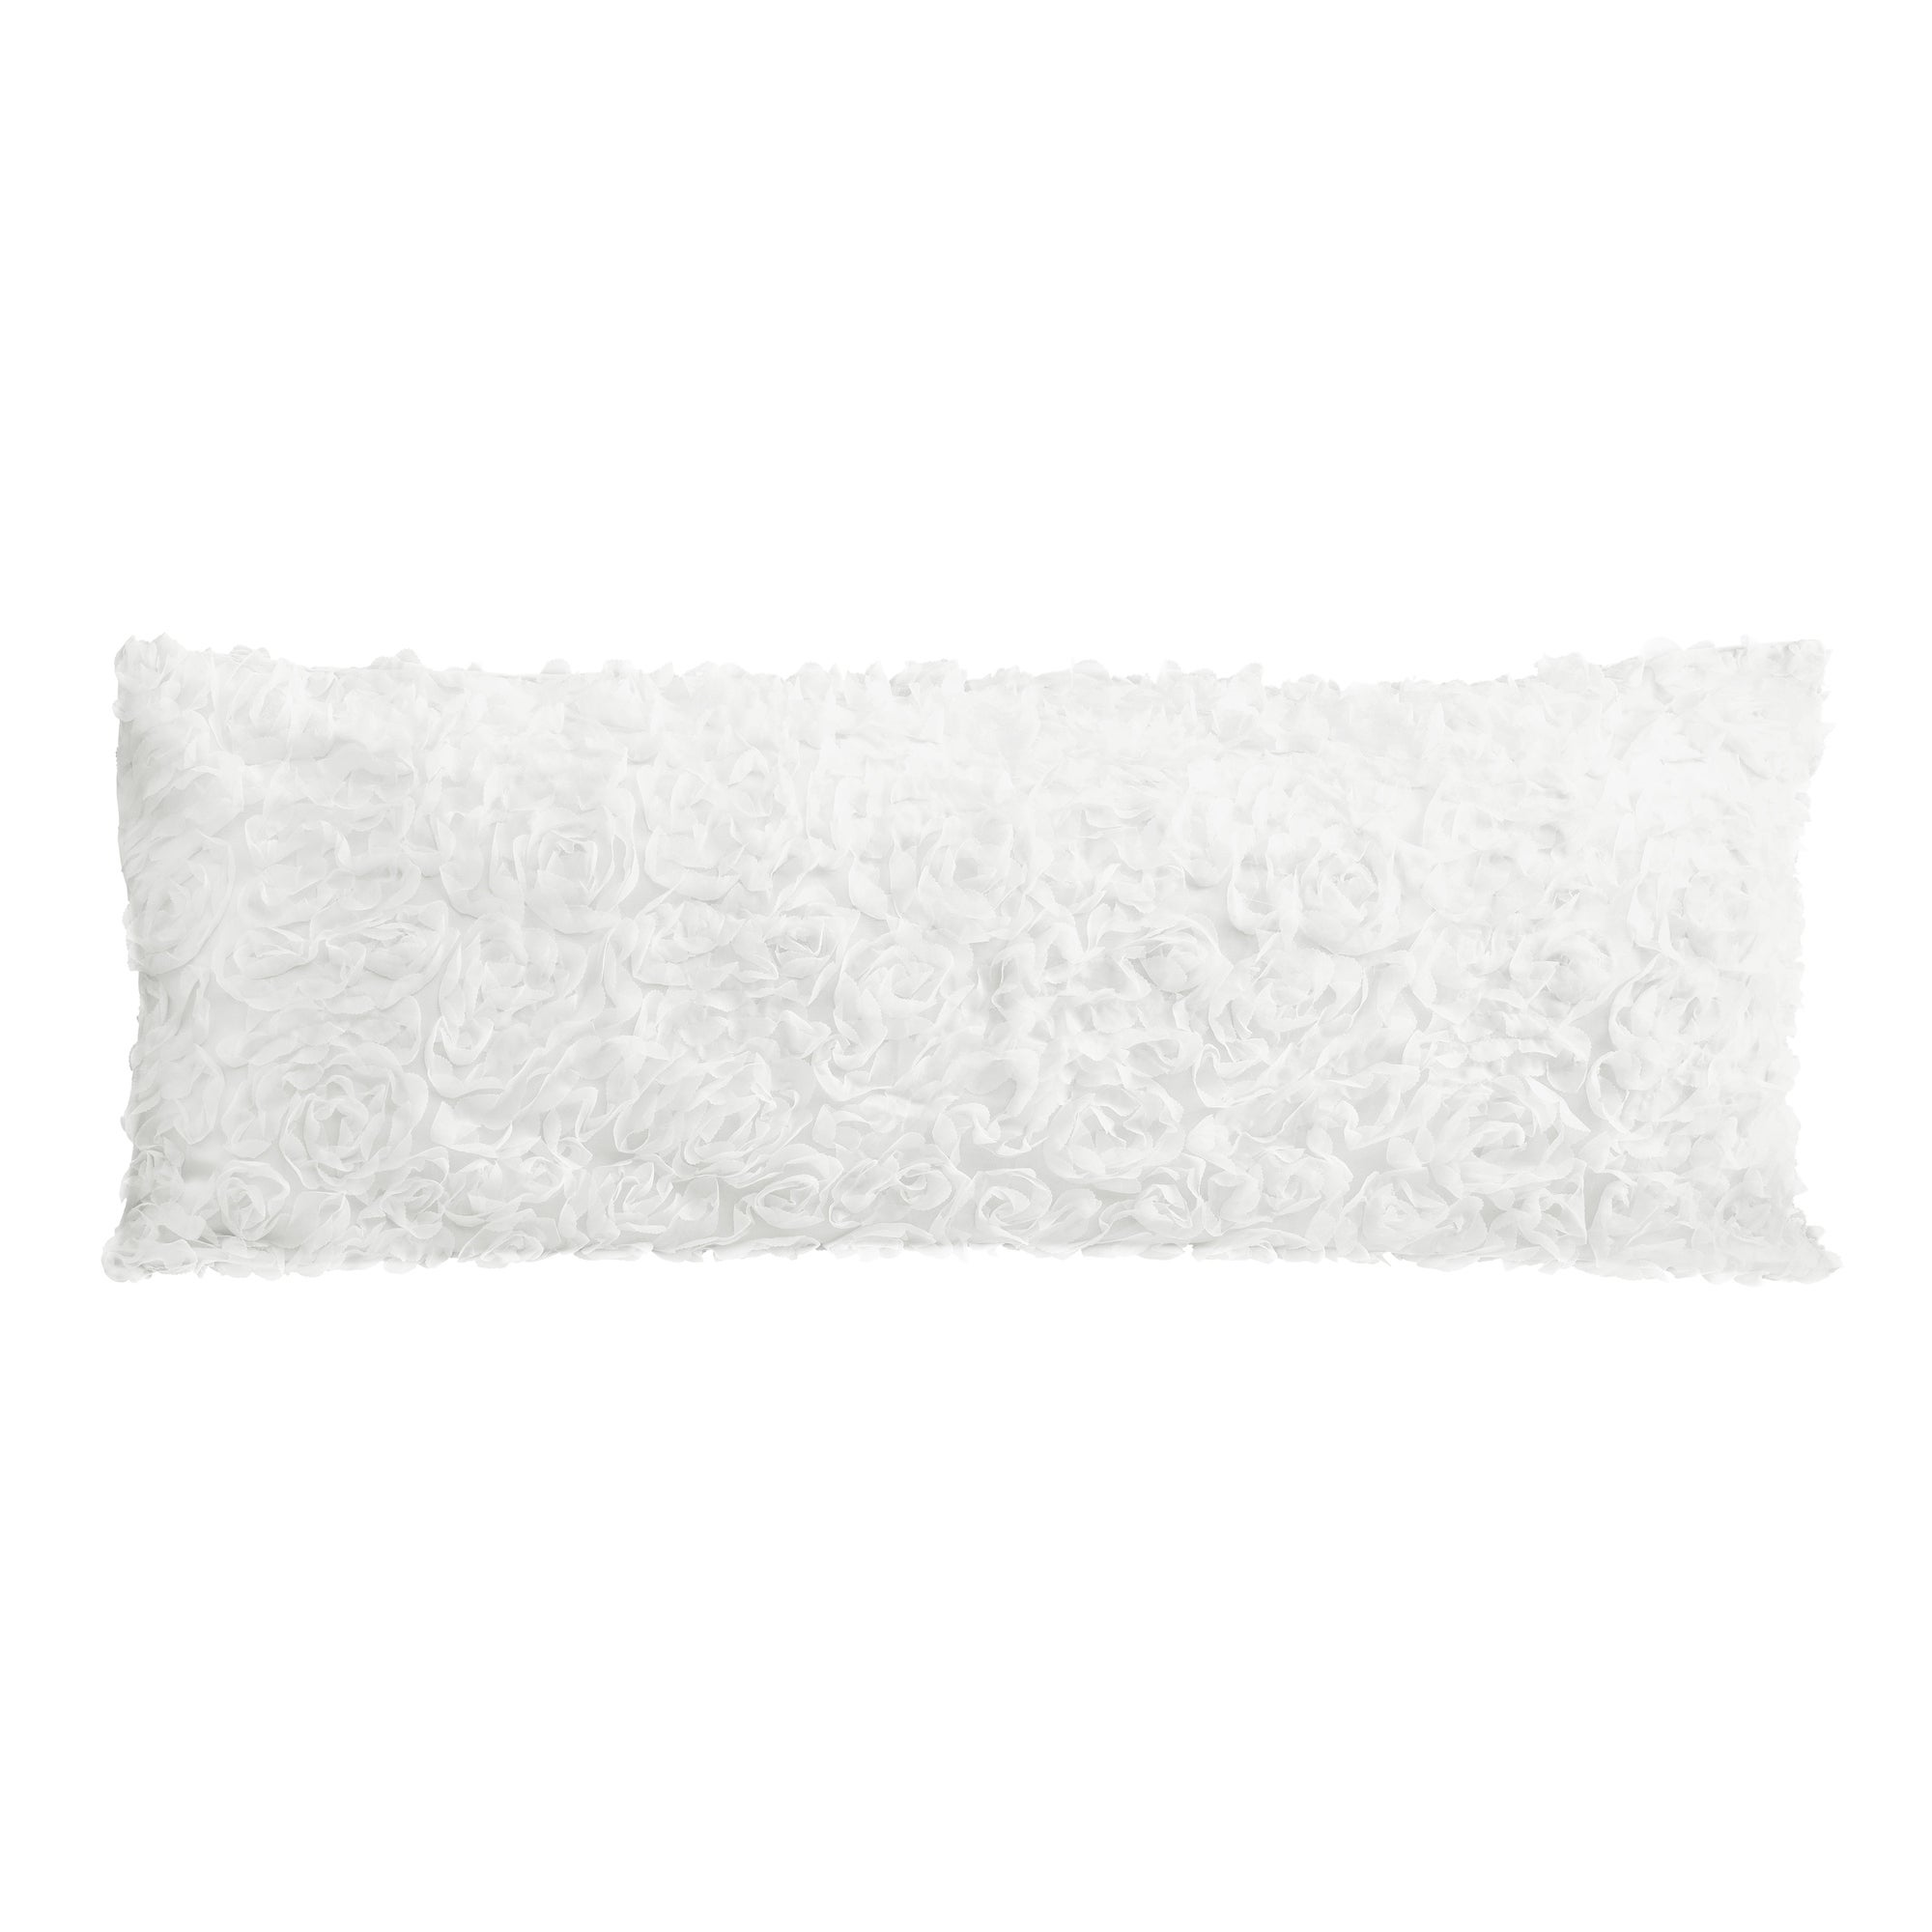 FREE SHIPPING!!!Vintage Pillowcase Floral White Daisy